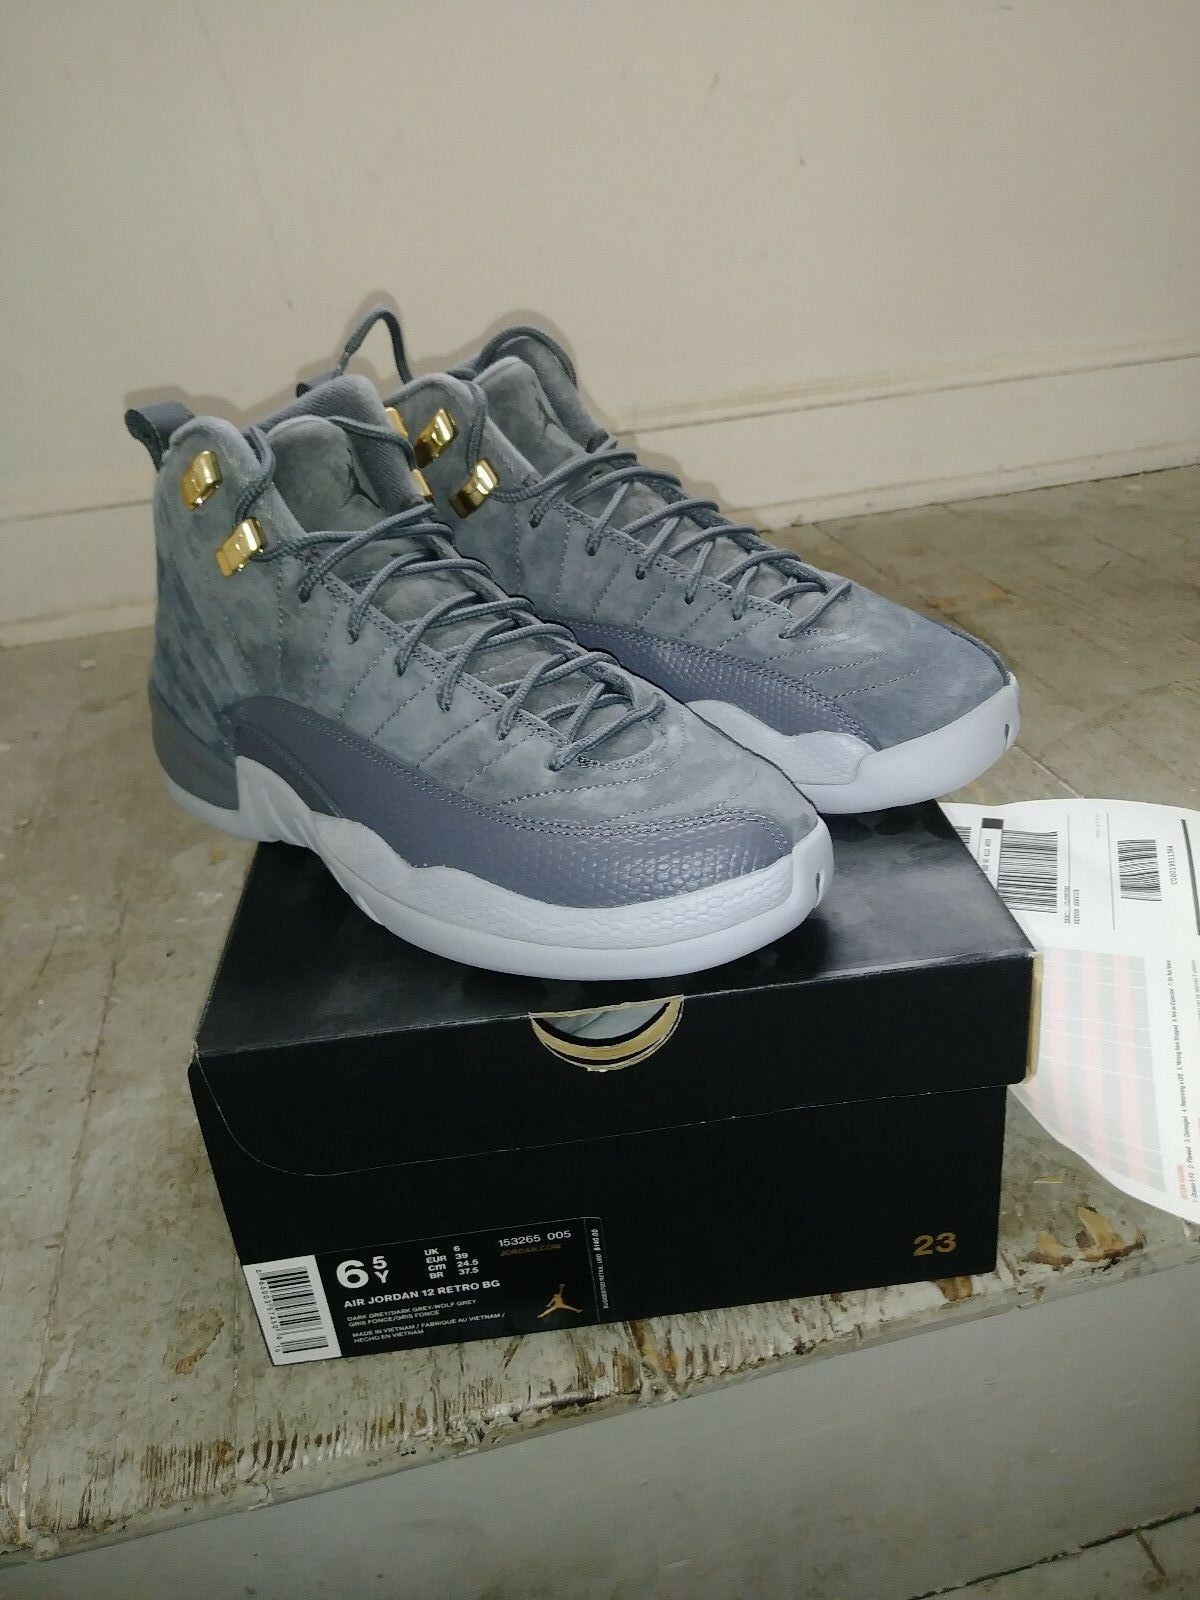 best website 232db bed8d ... zapatos oscuro nuevo azul naranja where to buy air jordan 12 retro bg  dark gris wolf gris 005 cool gris temporada ...